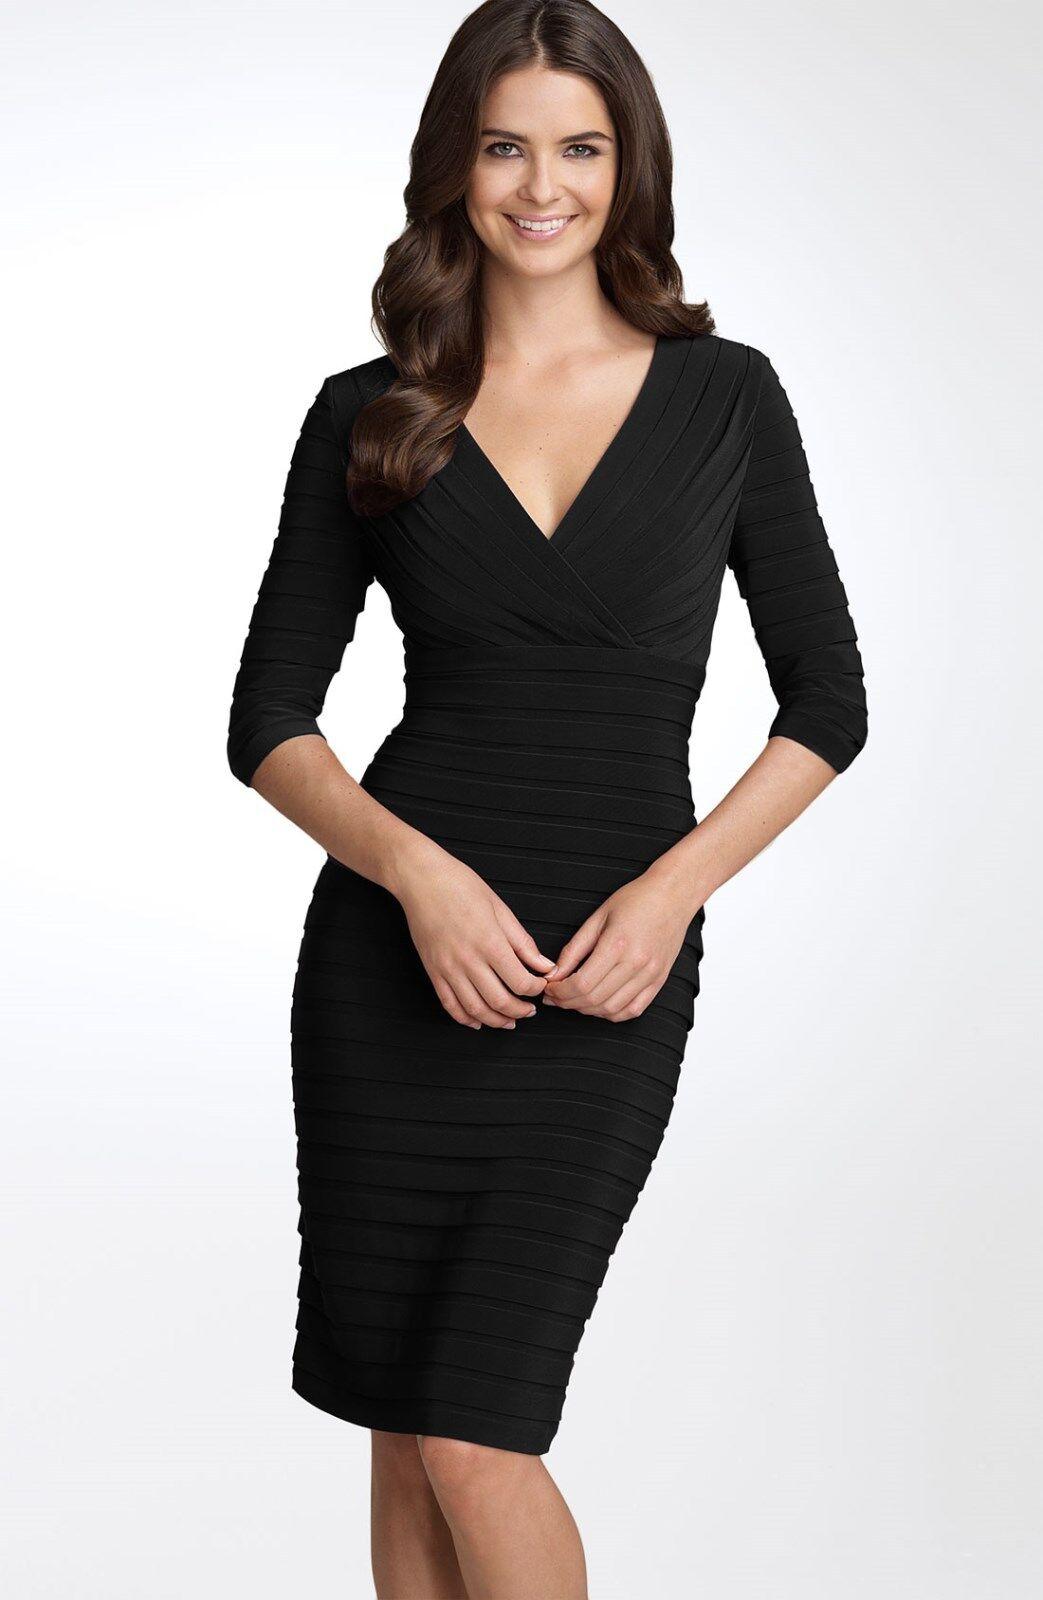 Adrianna Papell Pleated Jersey Sheath Dress ( Size 10P)